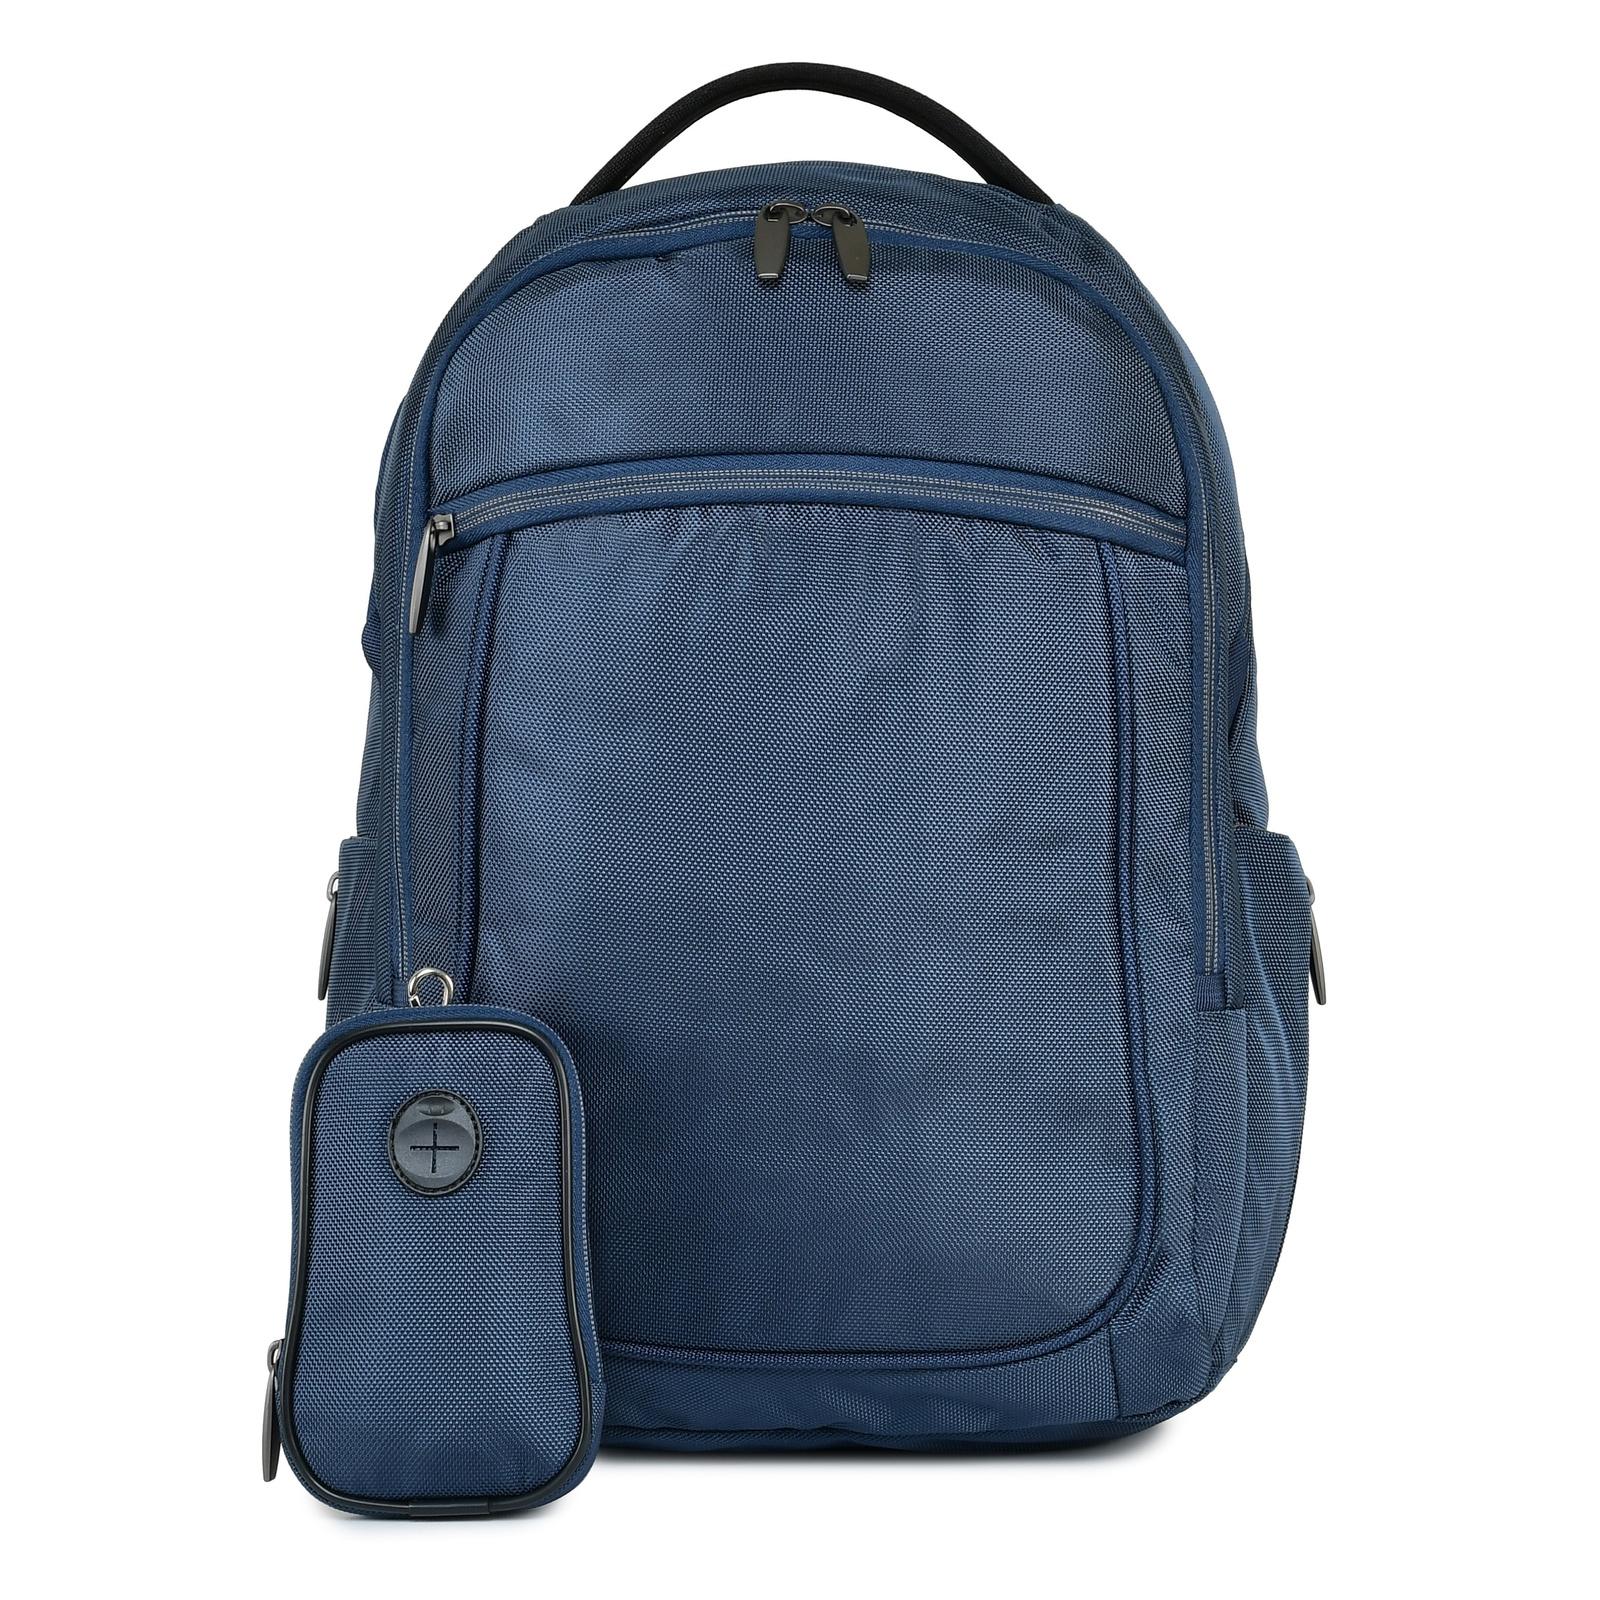 Рюкзак мужской MGitik RUORBl, синий рюкзак мужской quiksilver everydaypostemb m eqybp03501 bng0 королевский синий